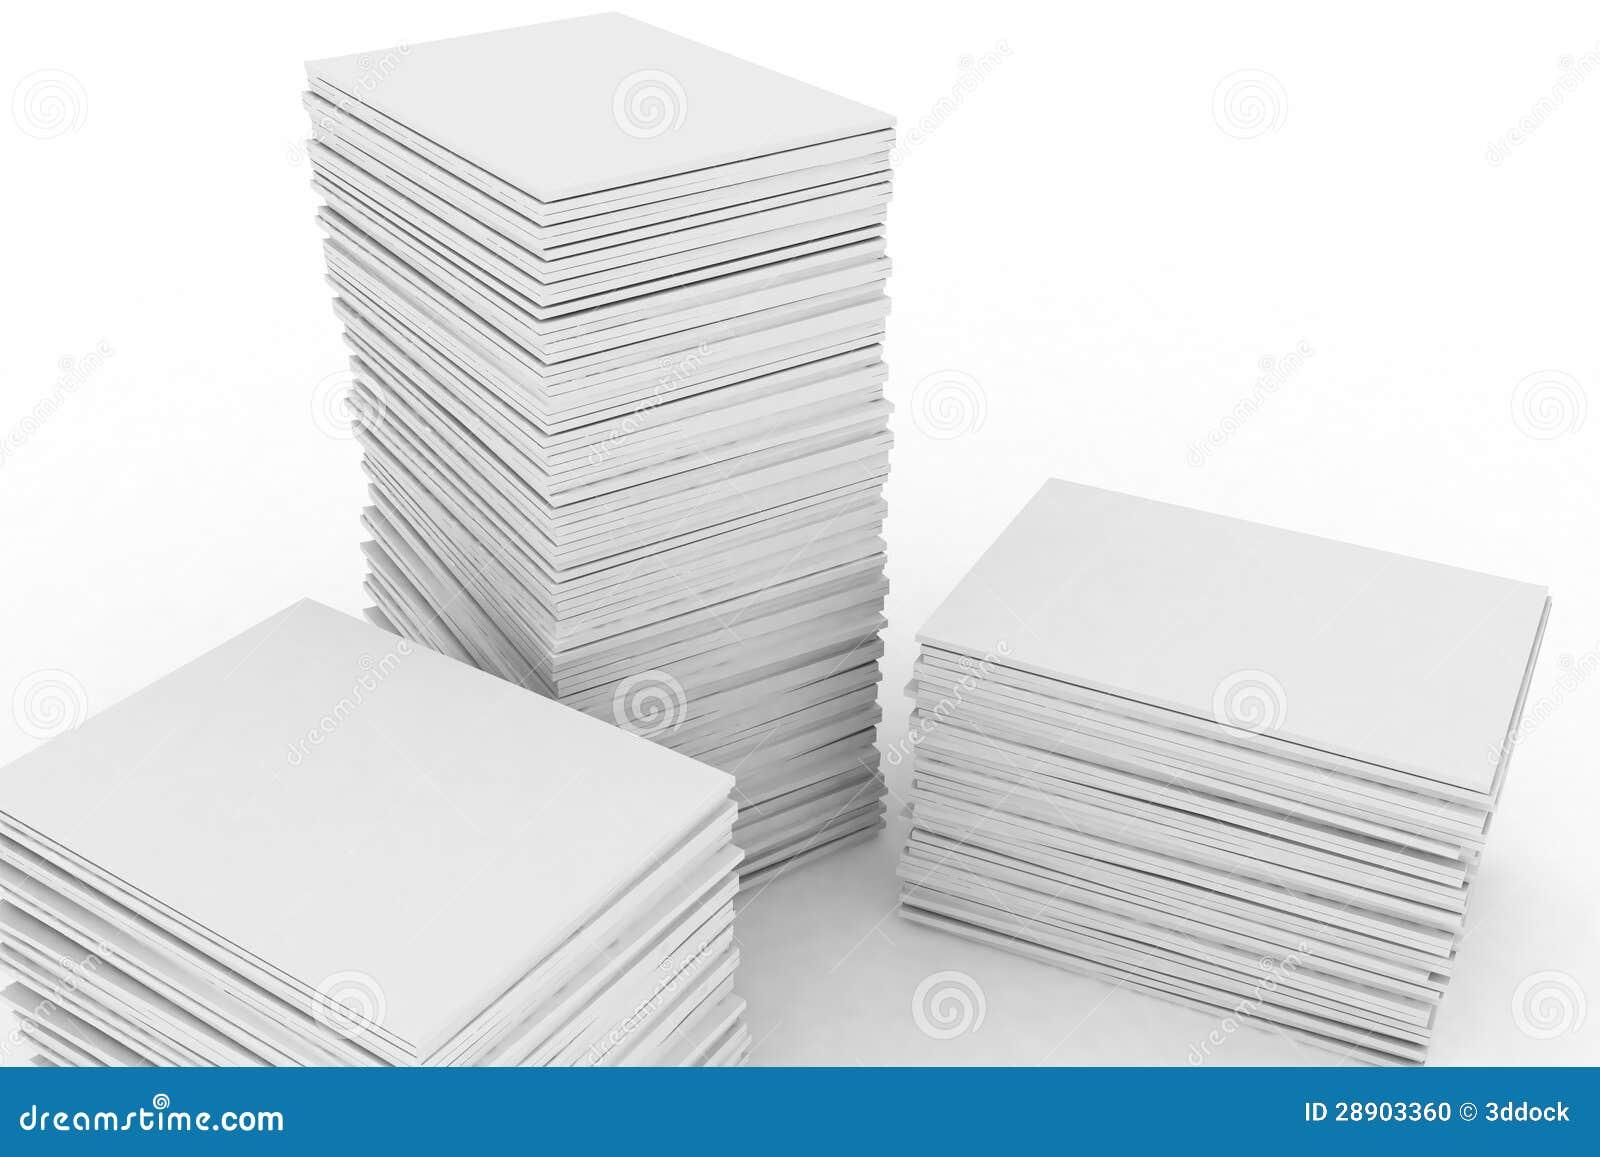 grande pile de papier illustration stock image du bureau 28903360. Black Bedroom Furniture Sets. Home Design Ideas